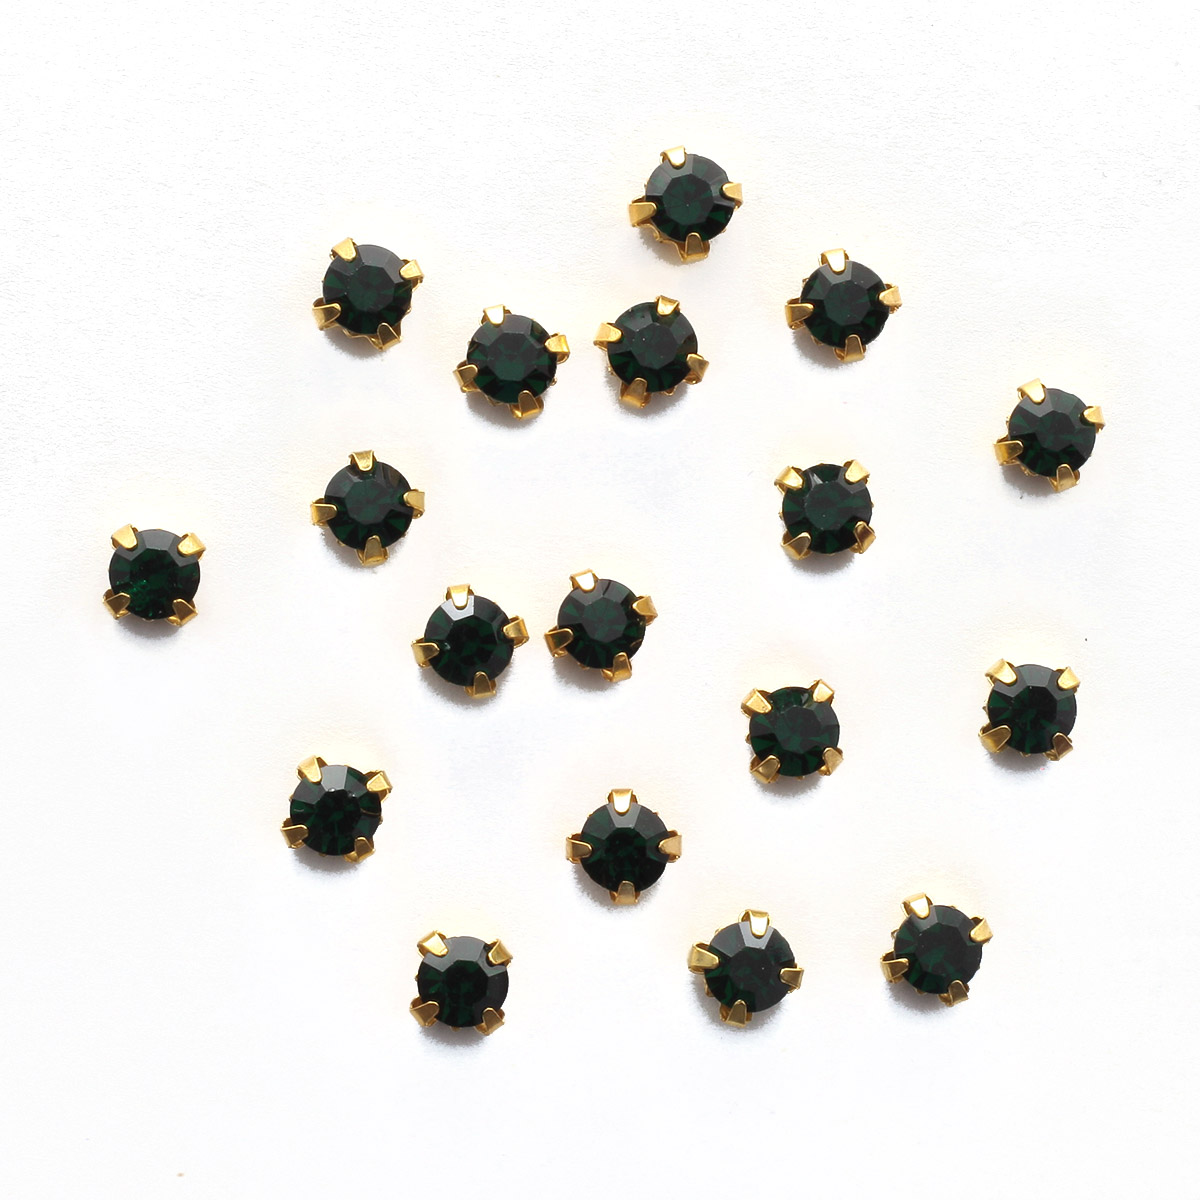 ЗЦ016НН66 Хрустальные стразы в цапах круглые (золото) изумруд 6*6мм, 20шт/упак Астра